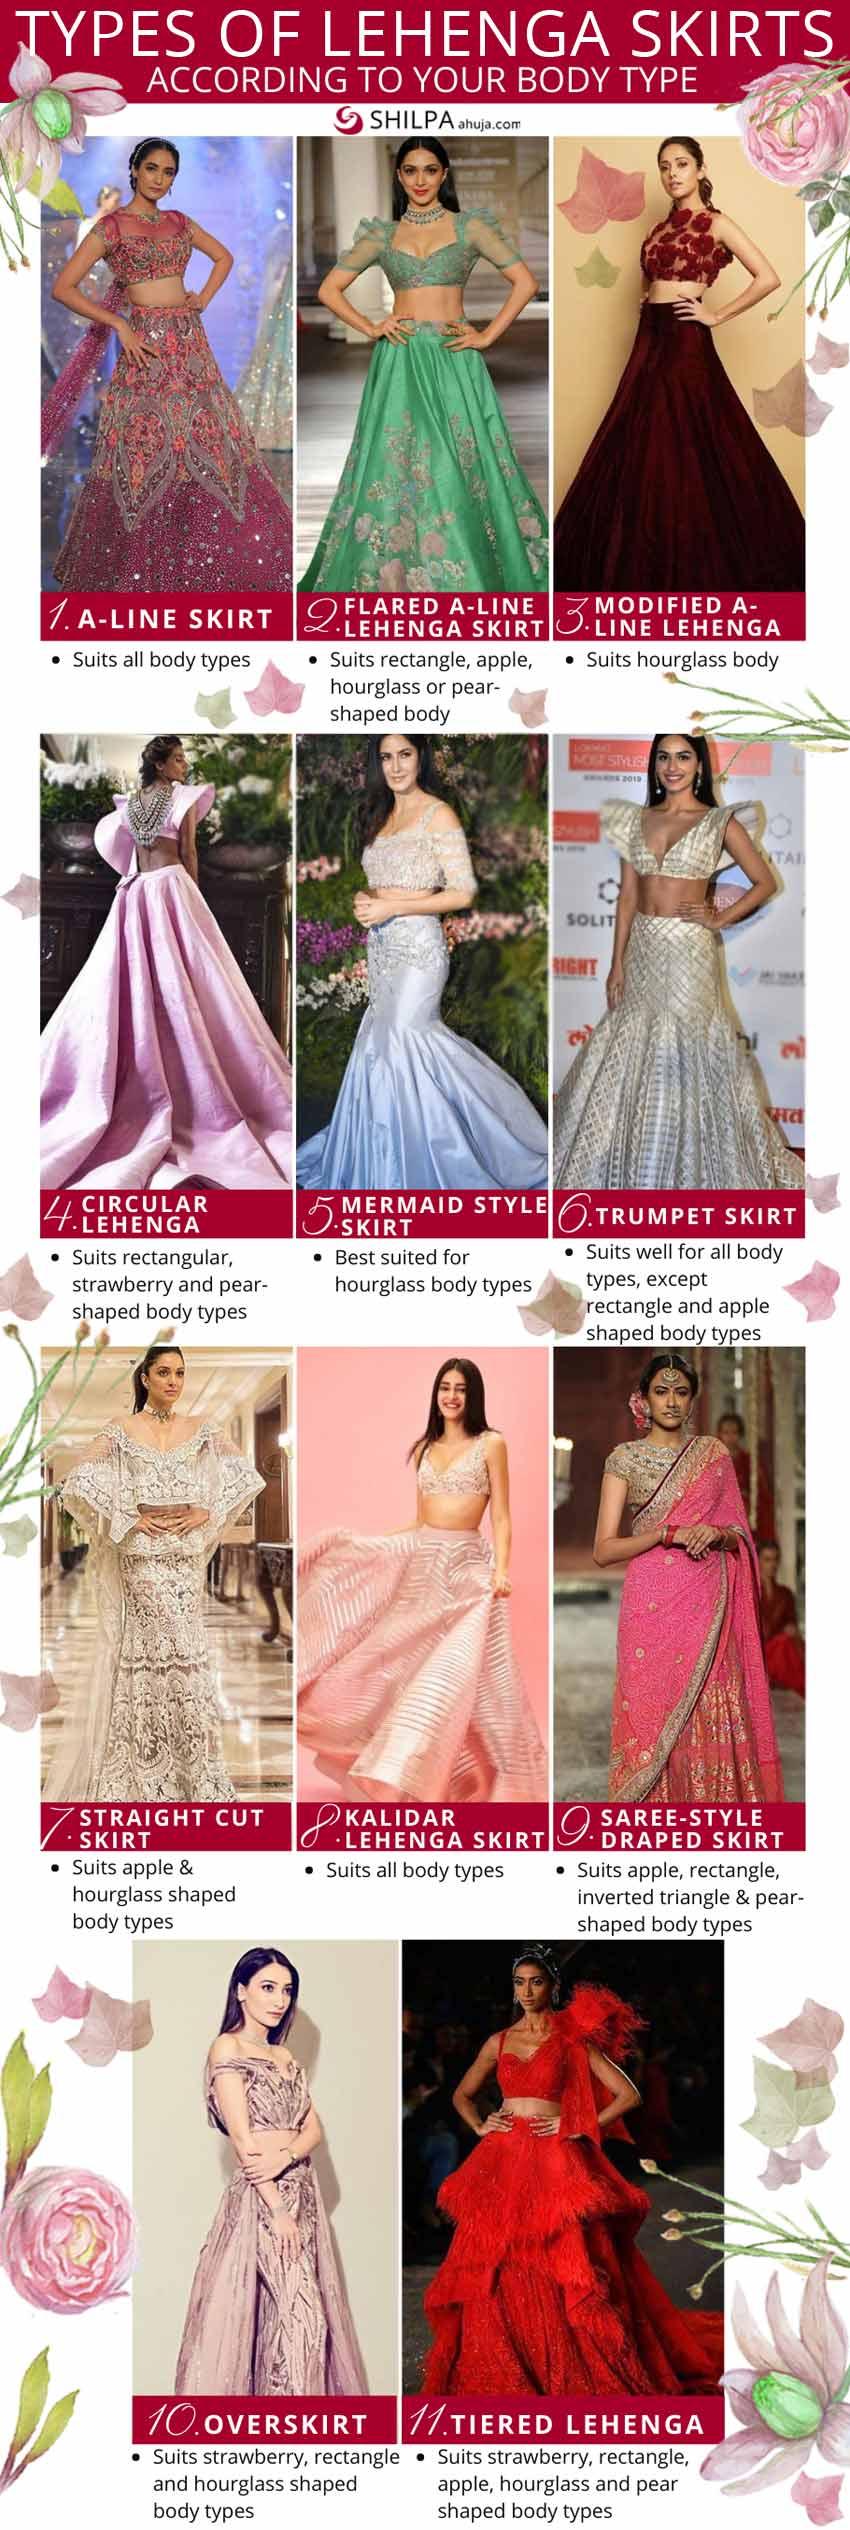 different-Types-of-Lehenga-Skirts-shapes-designs-lancha-chaniya-Body-Type